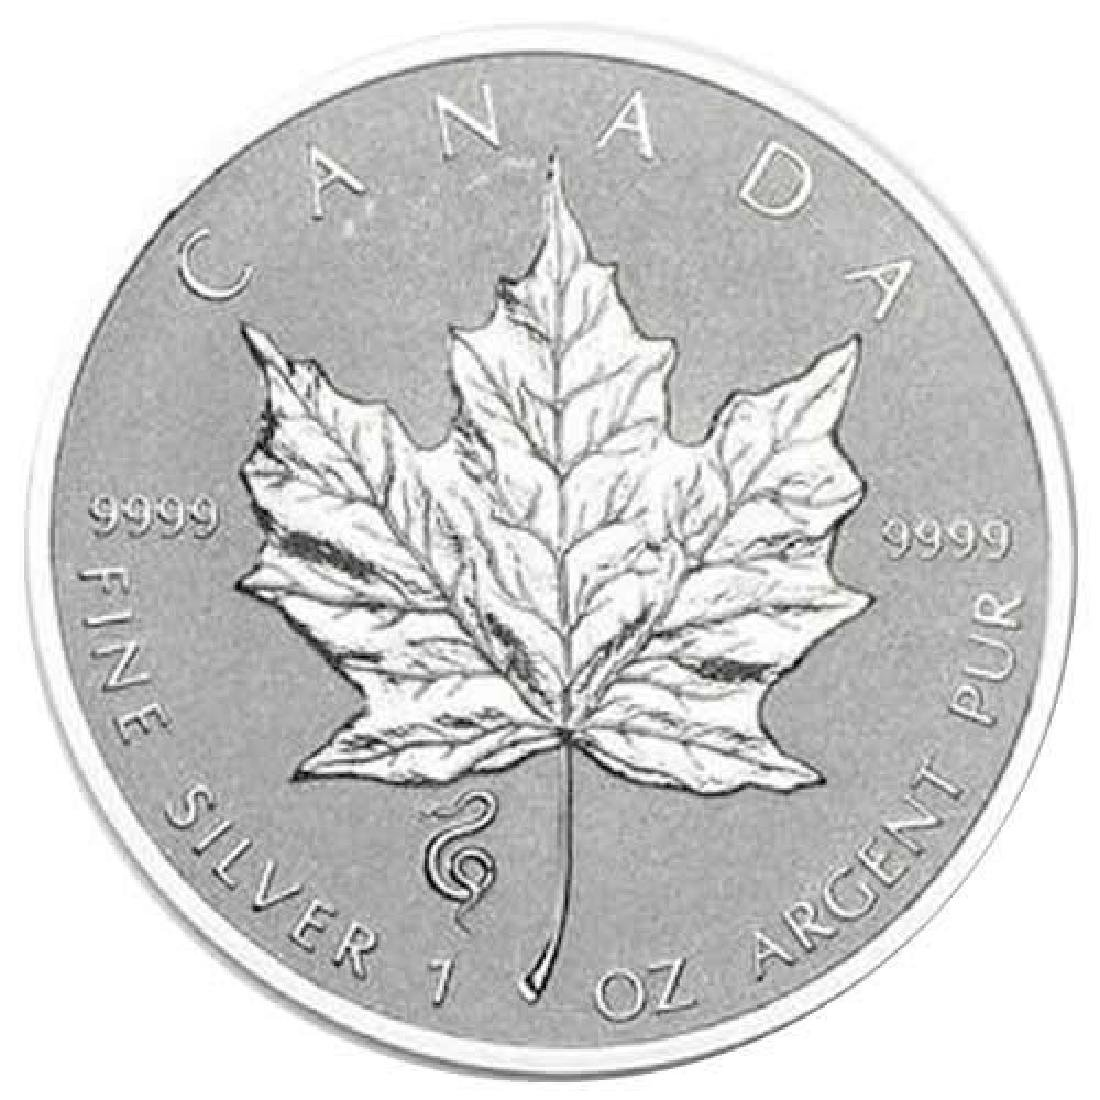 2013 Canada 1 oz. Silver Maple Leaf Reverse Proof Snake